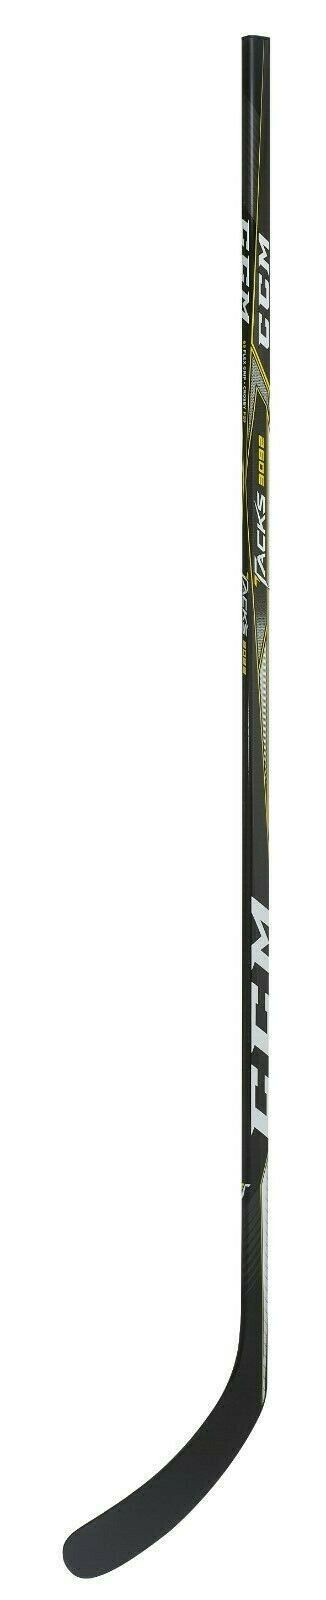 CCM Tacks 3092 Intermediate Ice Hockey Stick